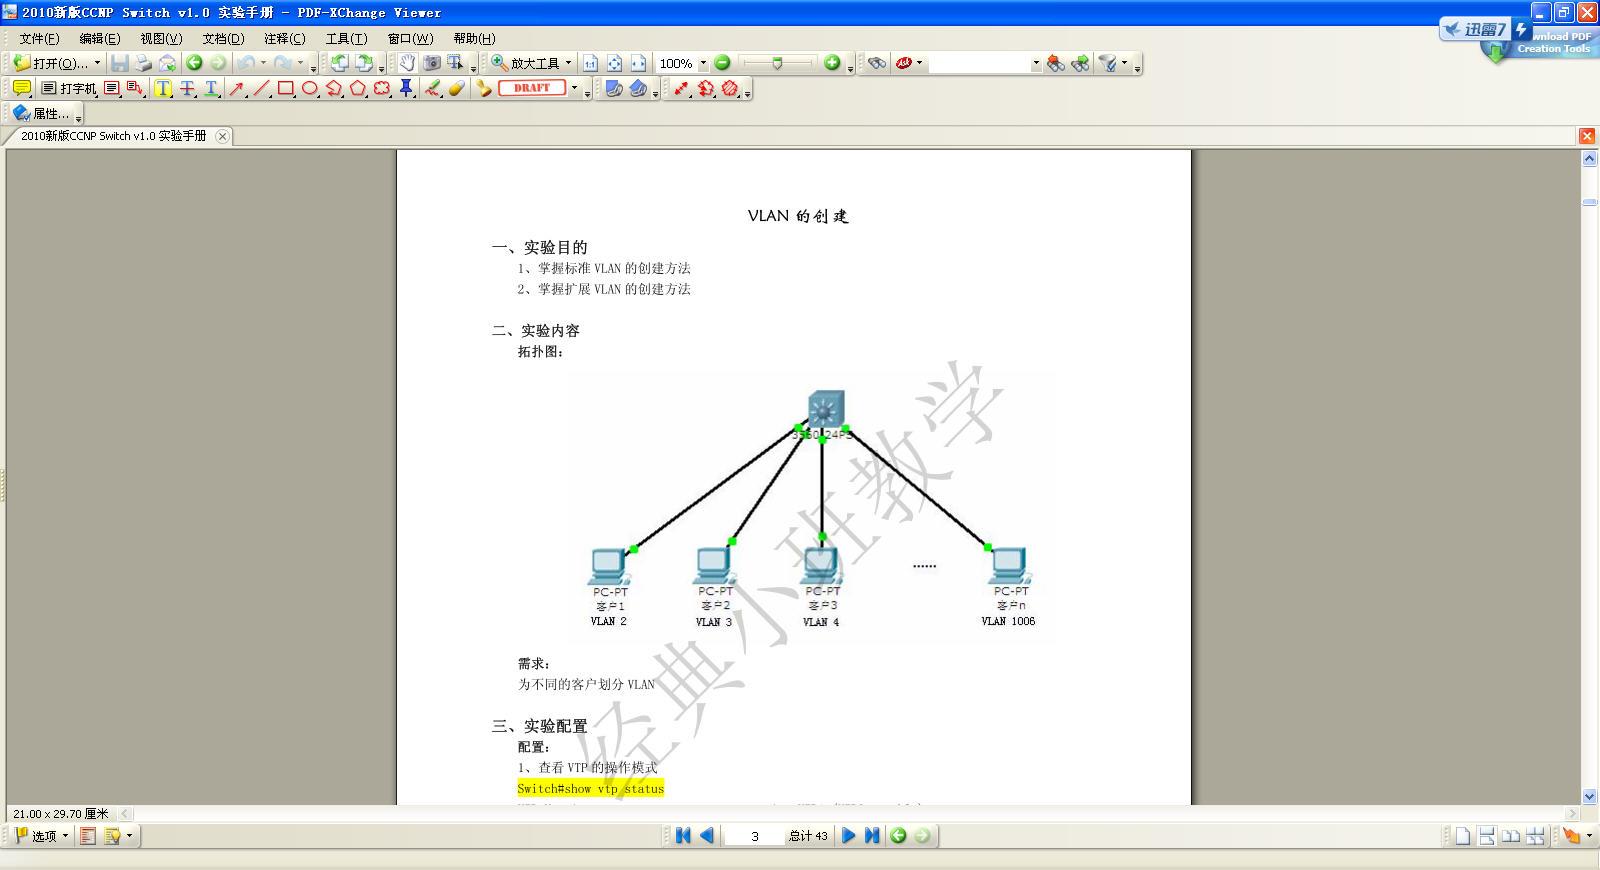 CCNP SwitchV1.0 试验分解指南